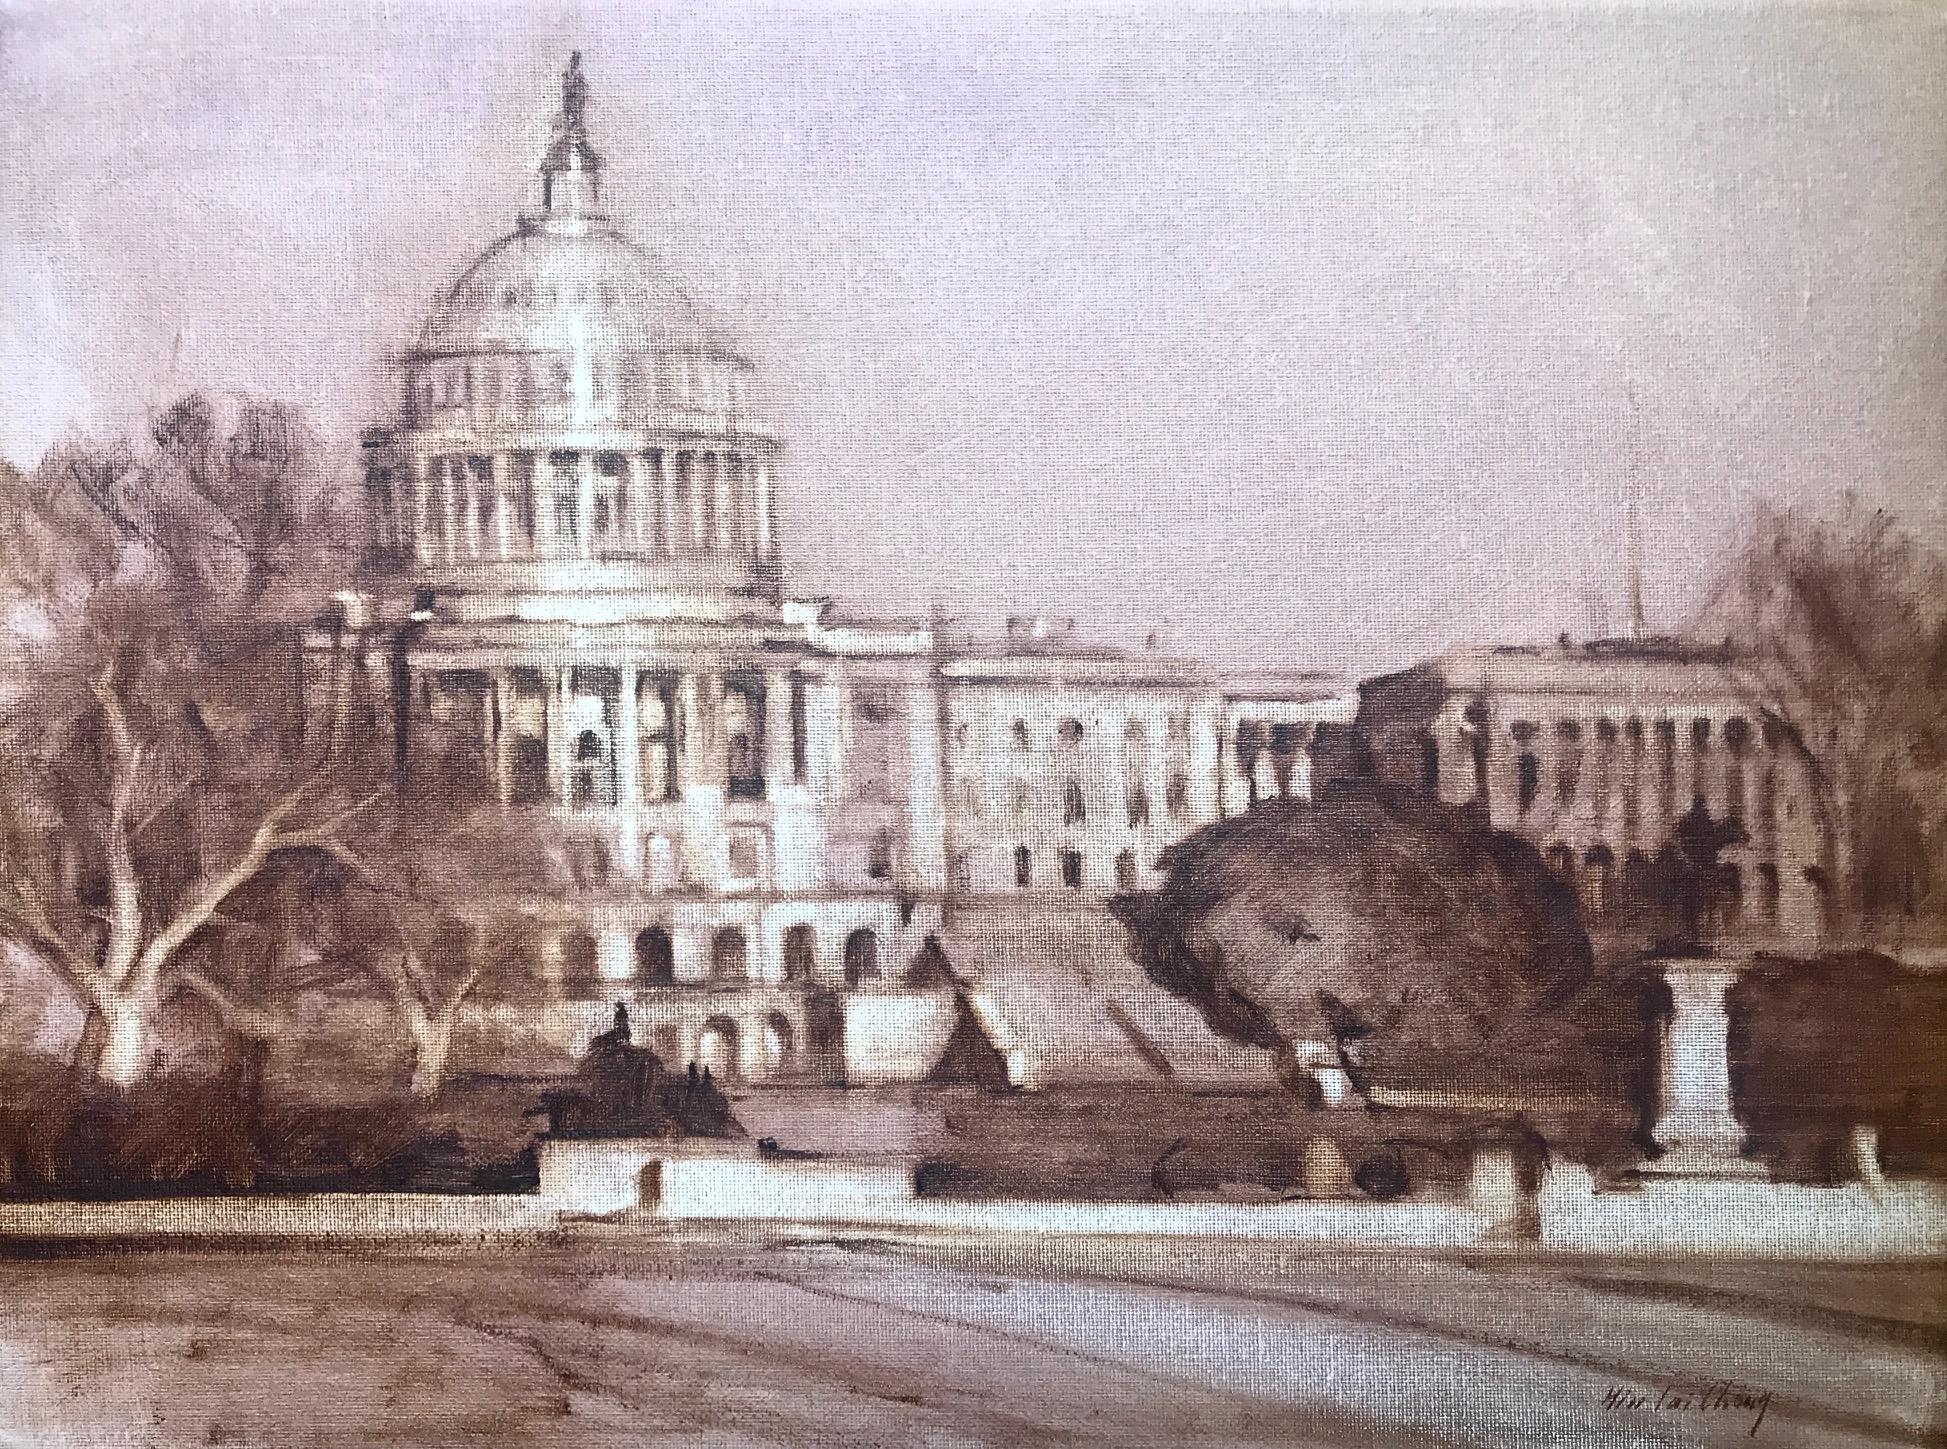 The Capitol by Hiu Lai Chong